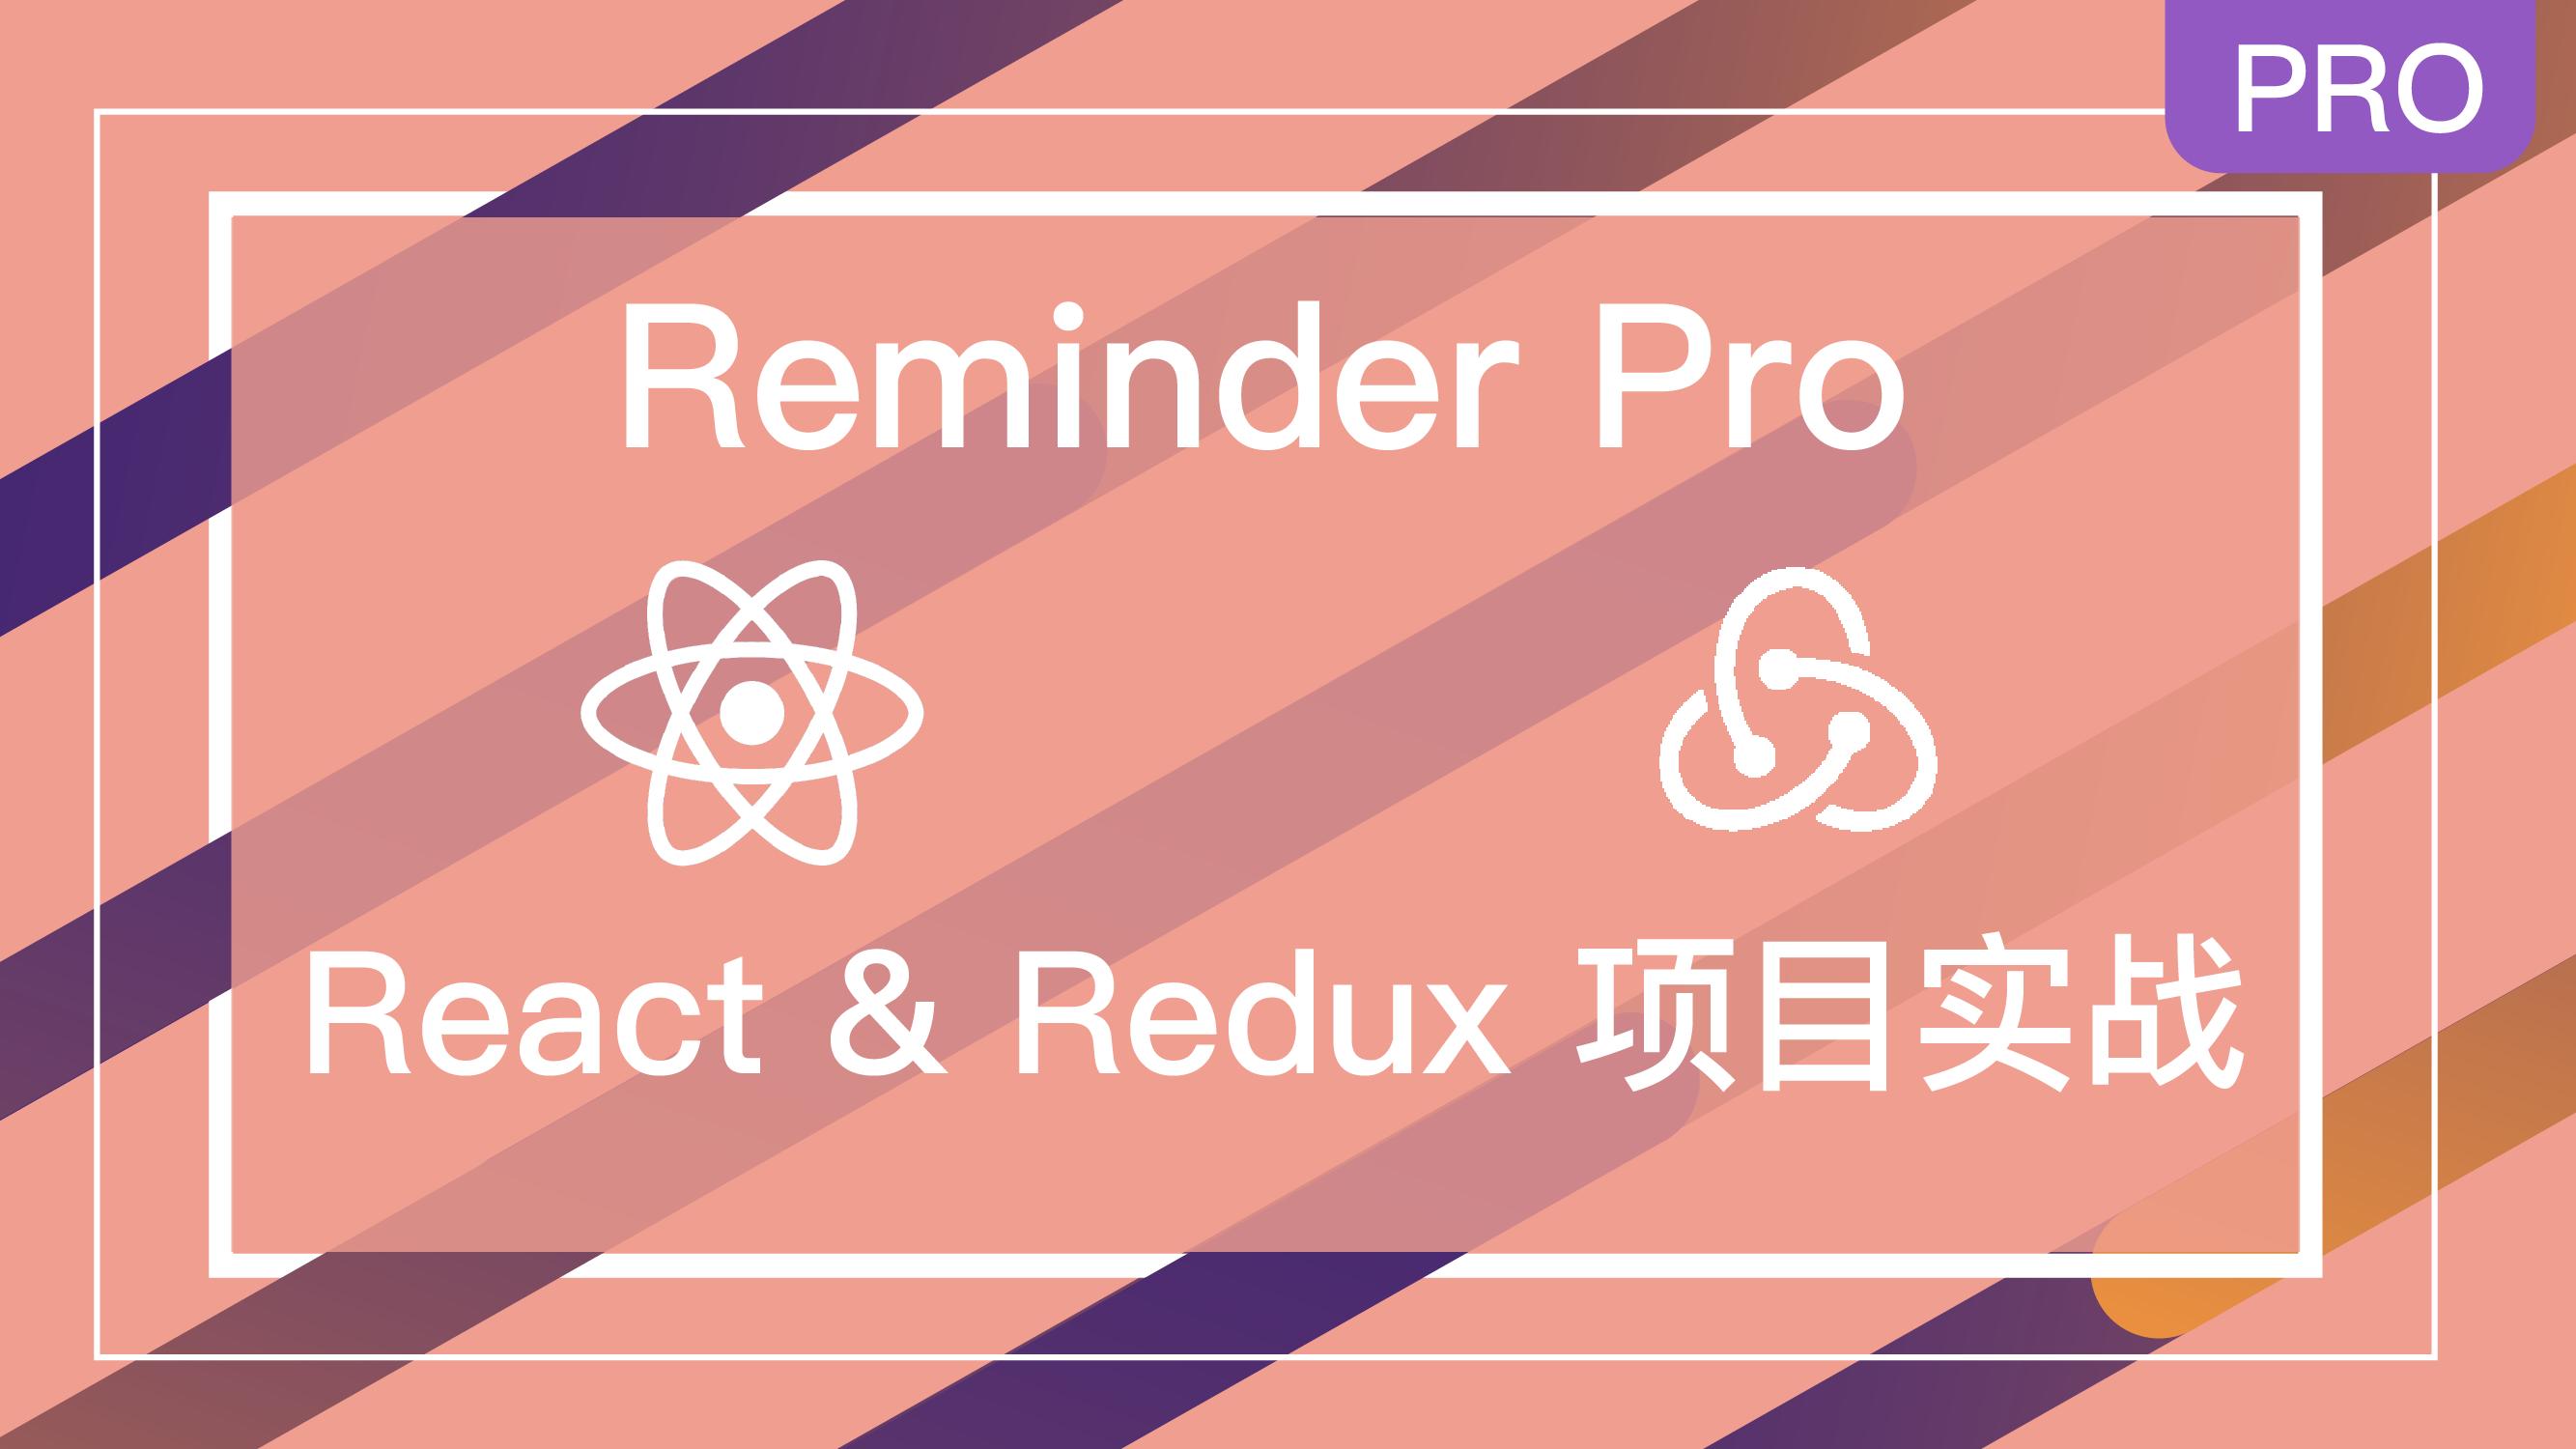 React & Redux 实战 Reminder Pro 项目 免费视频教程